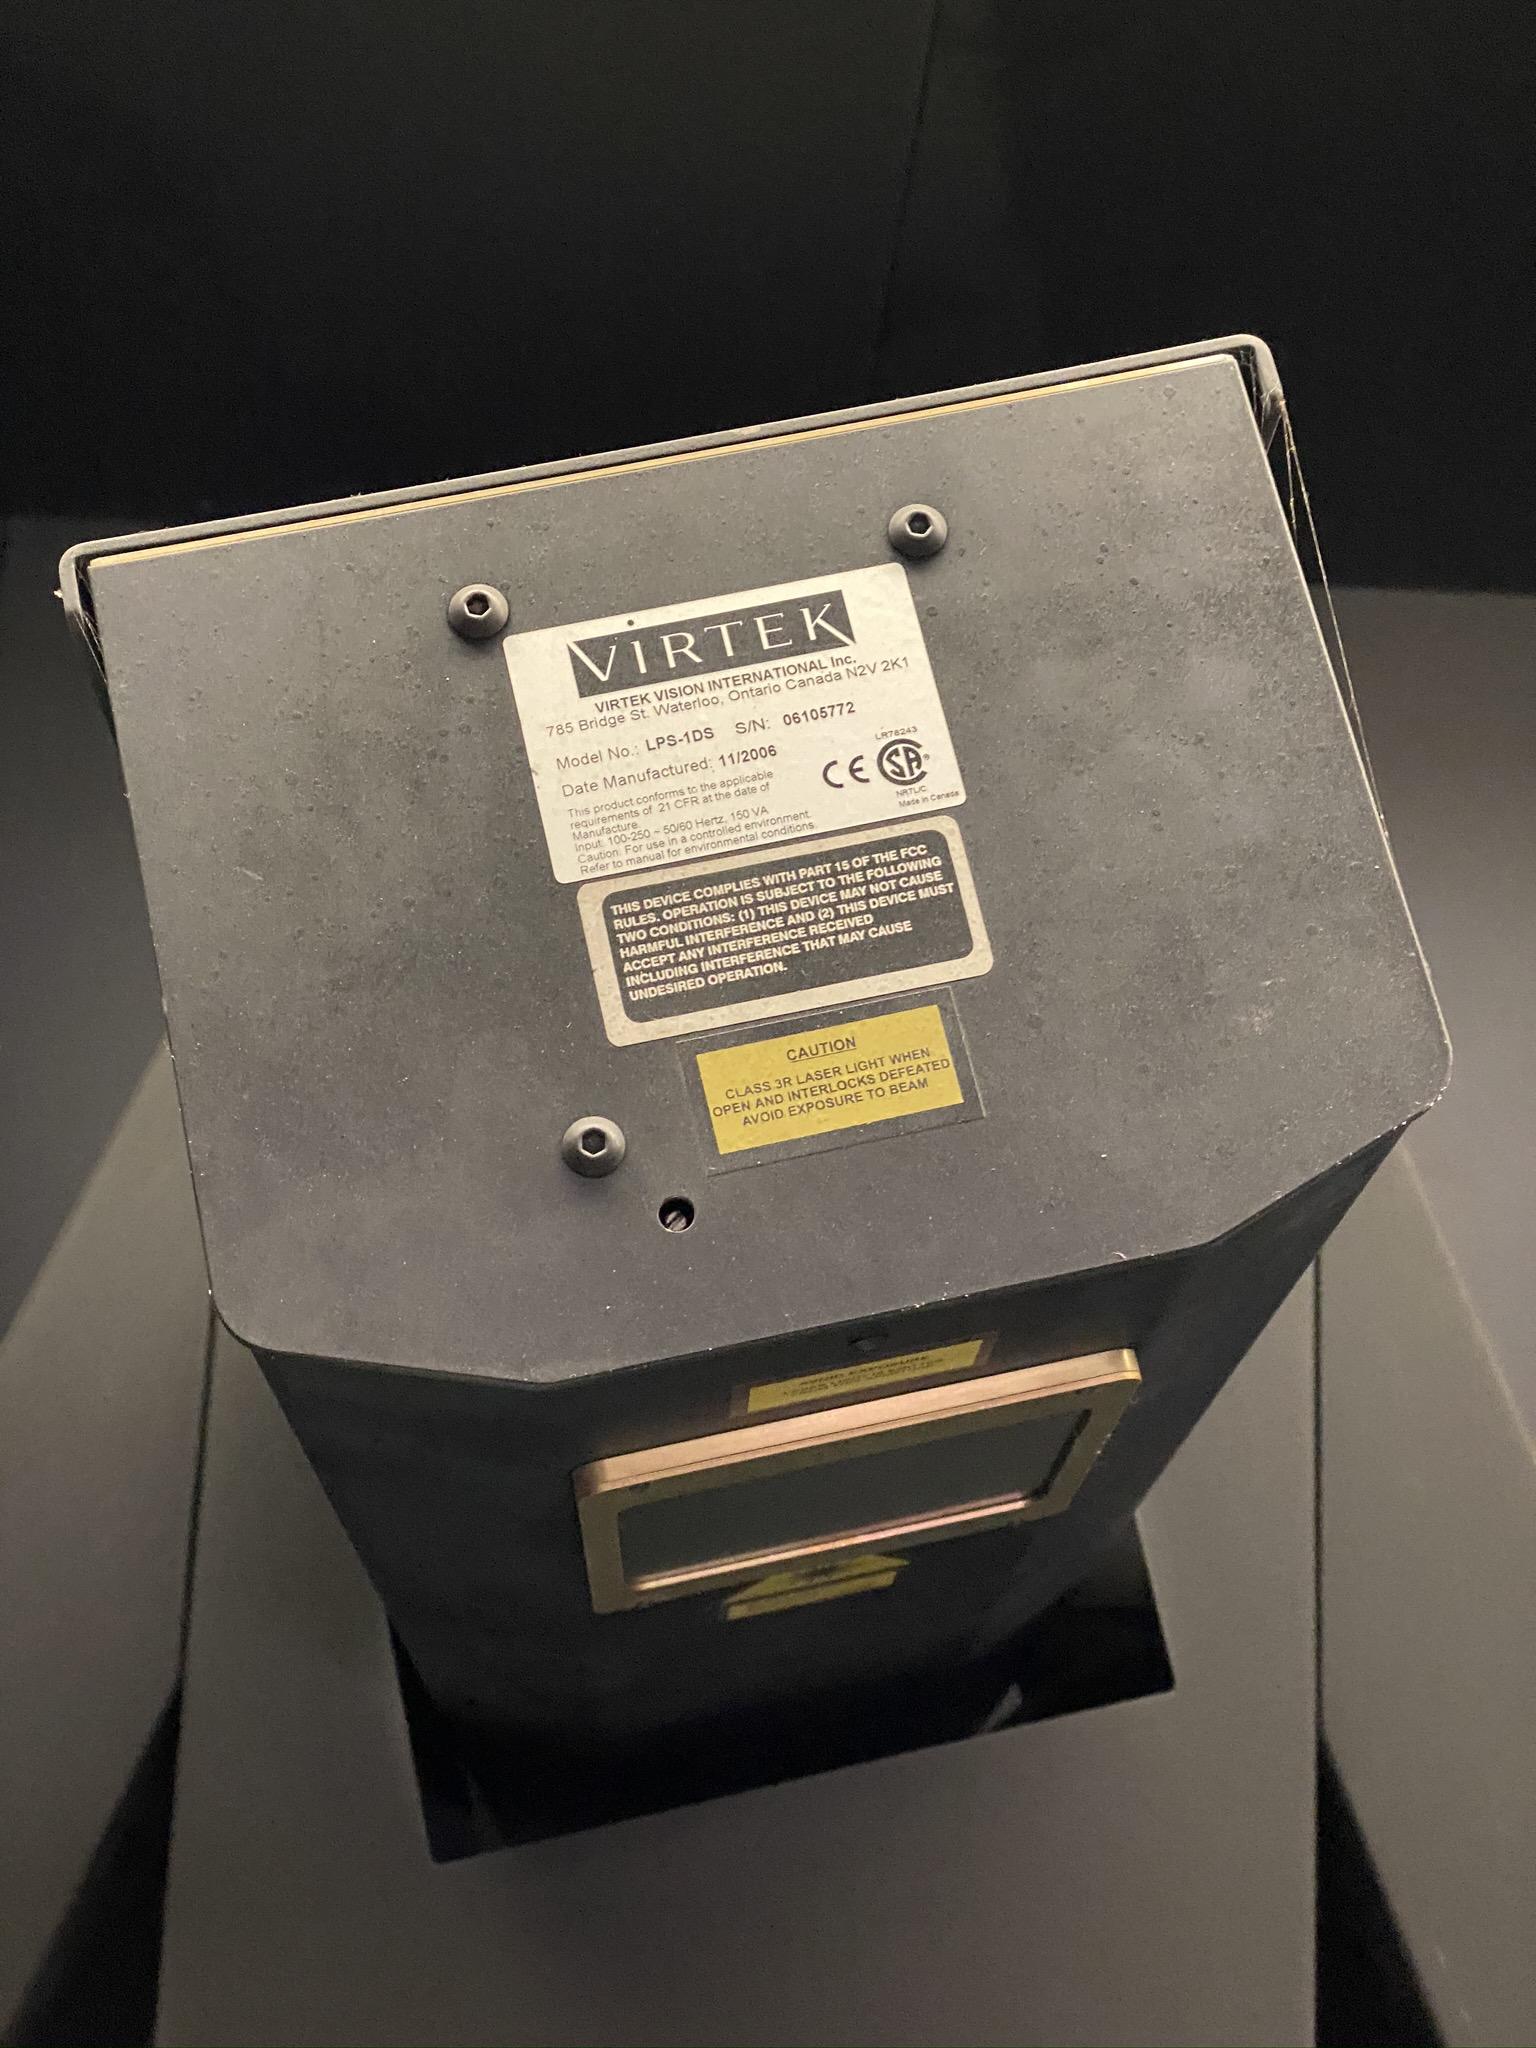 2006 VERTEK LPS-10S SCANNER, S/N 06105772 (NOTE: NEEDS NEW LASER HEAD, AS THE CURRENT ONE HAS LOST - Image 6 of 7